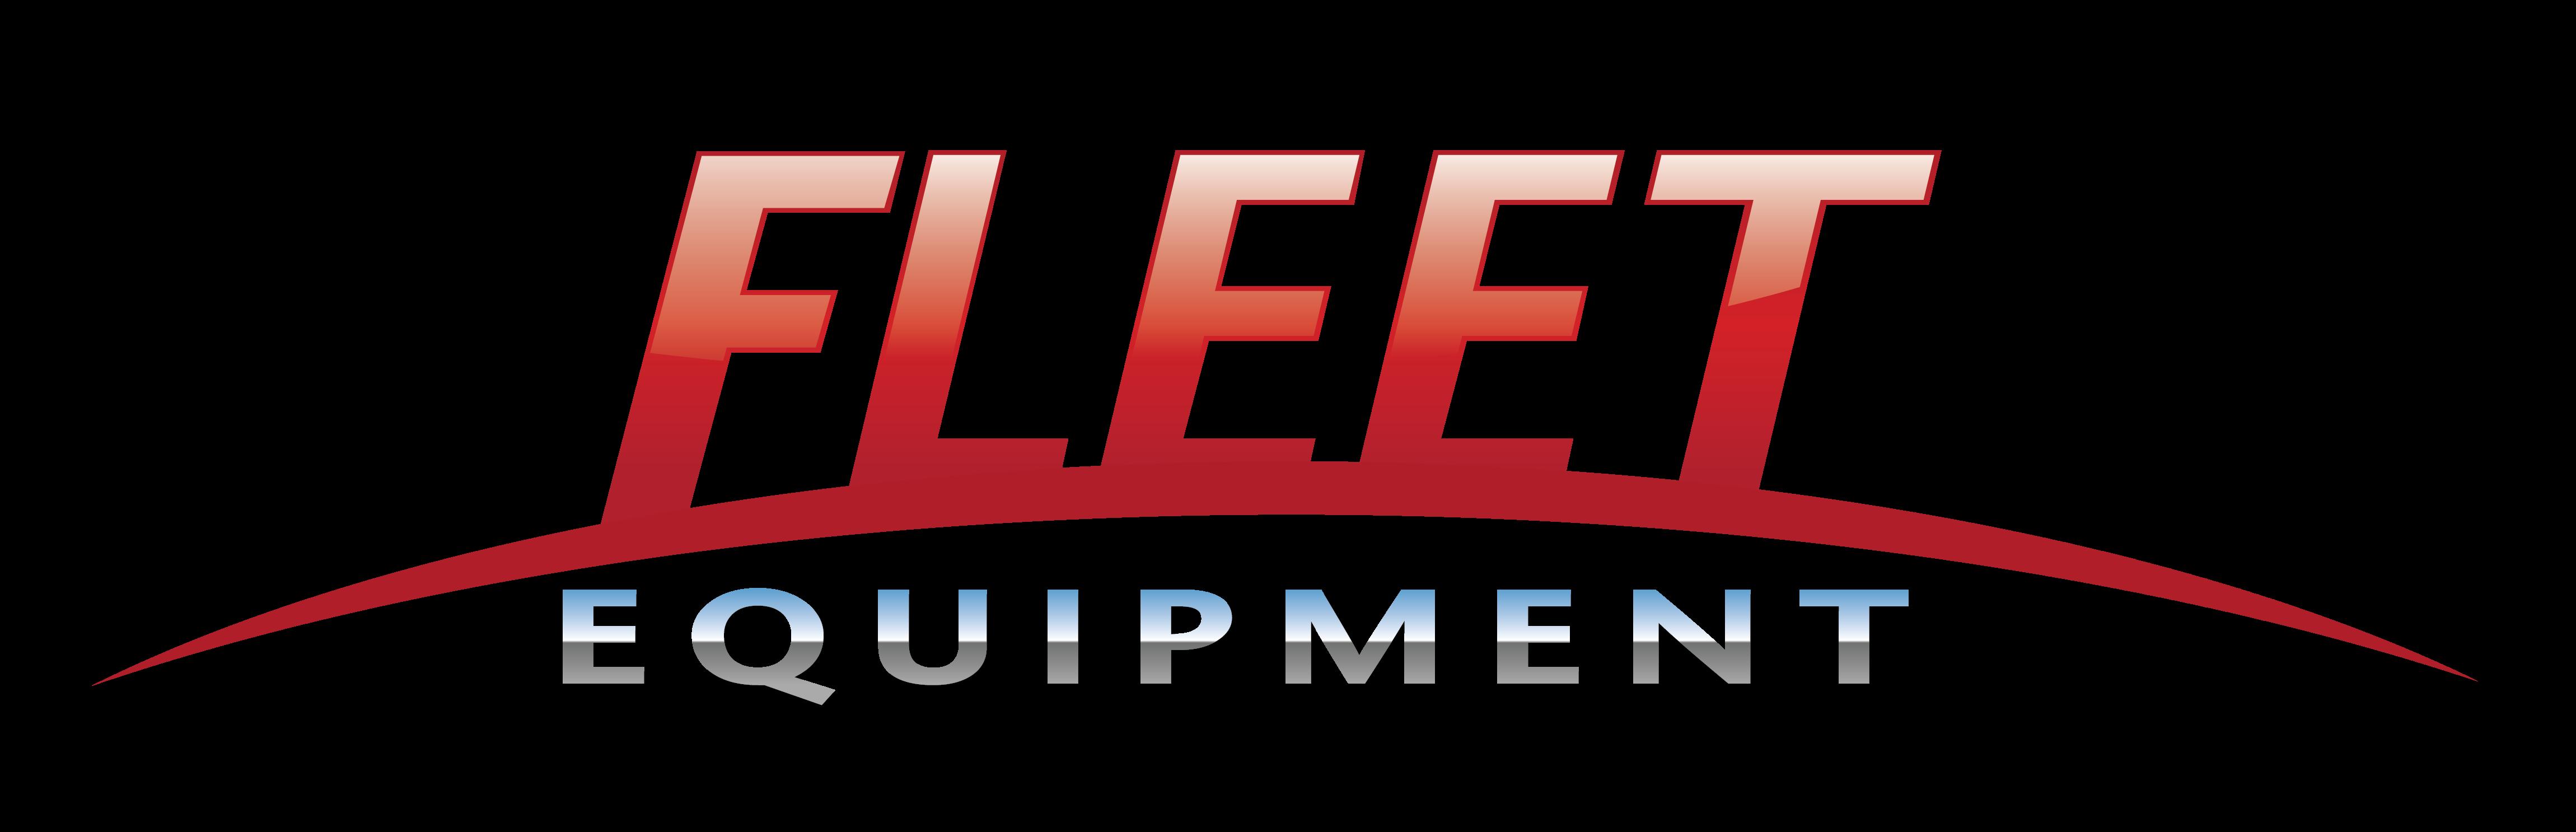 Fleet Equipment